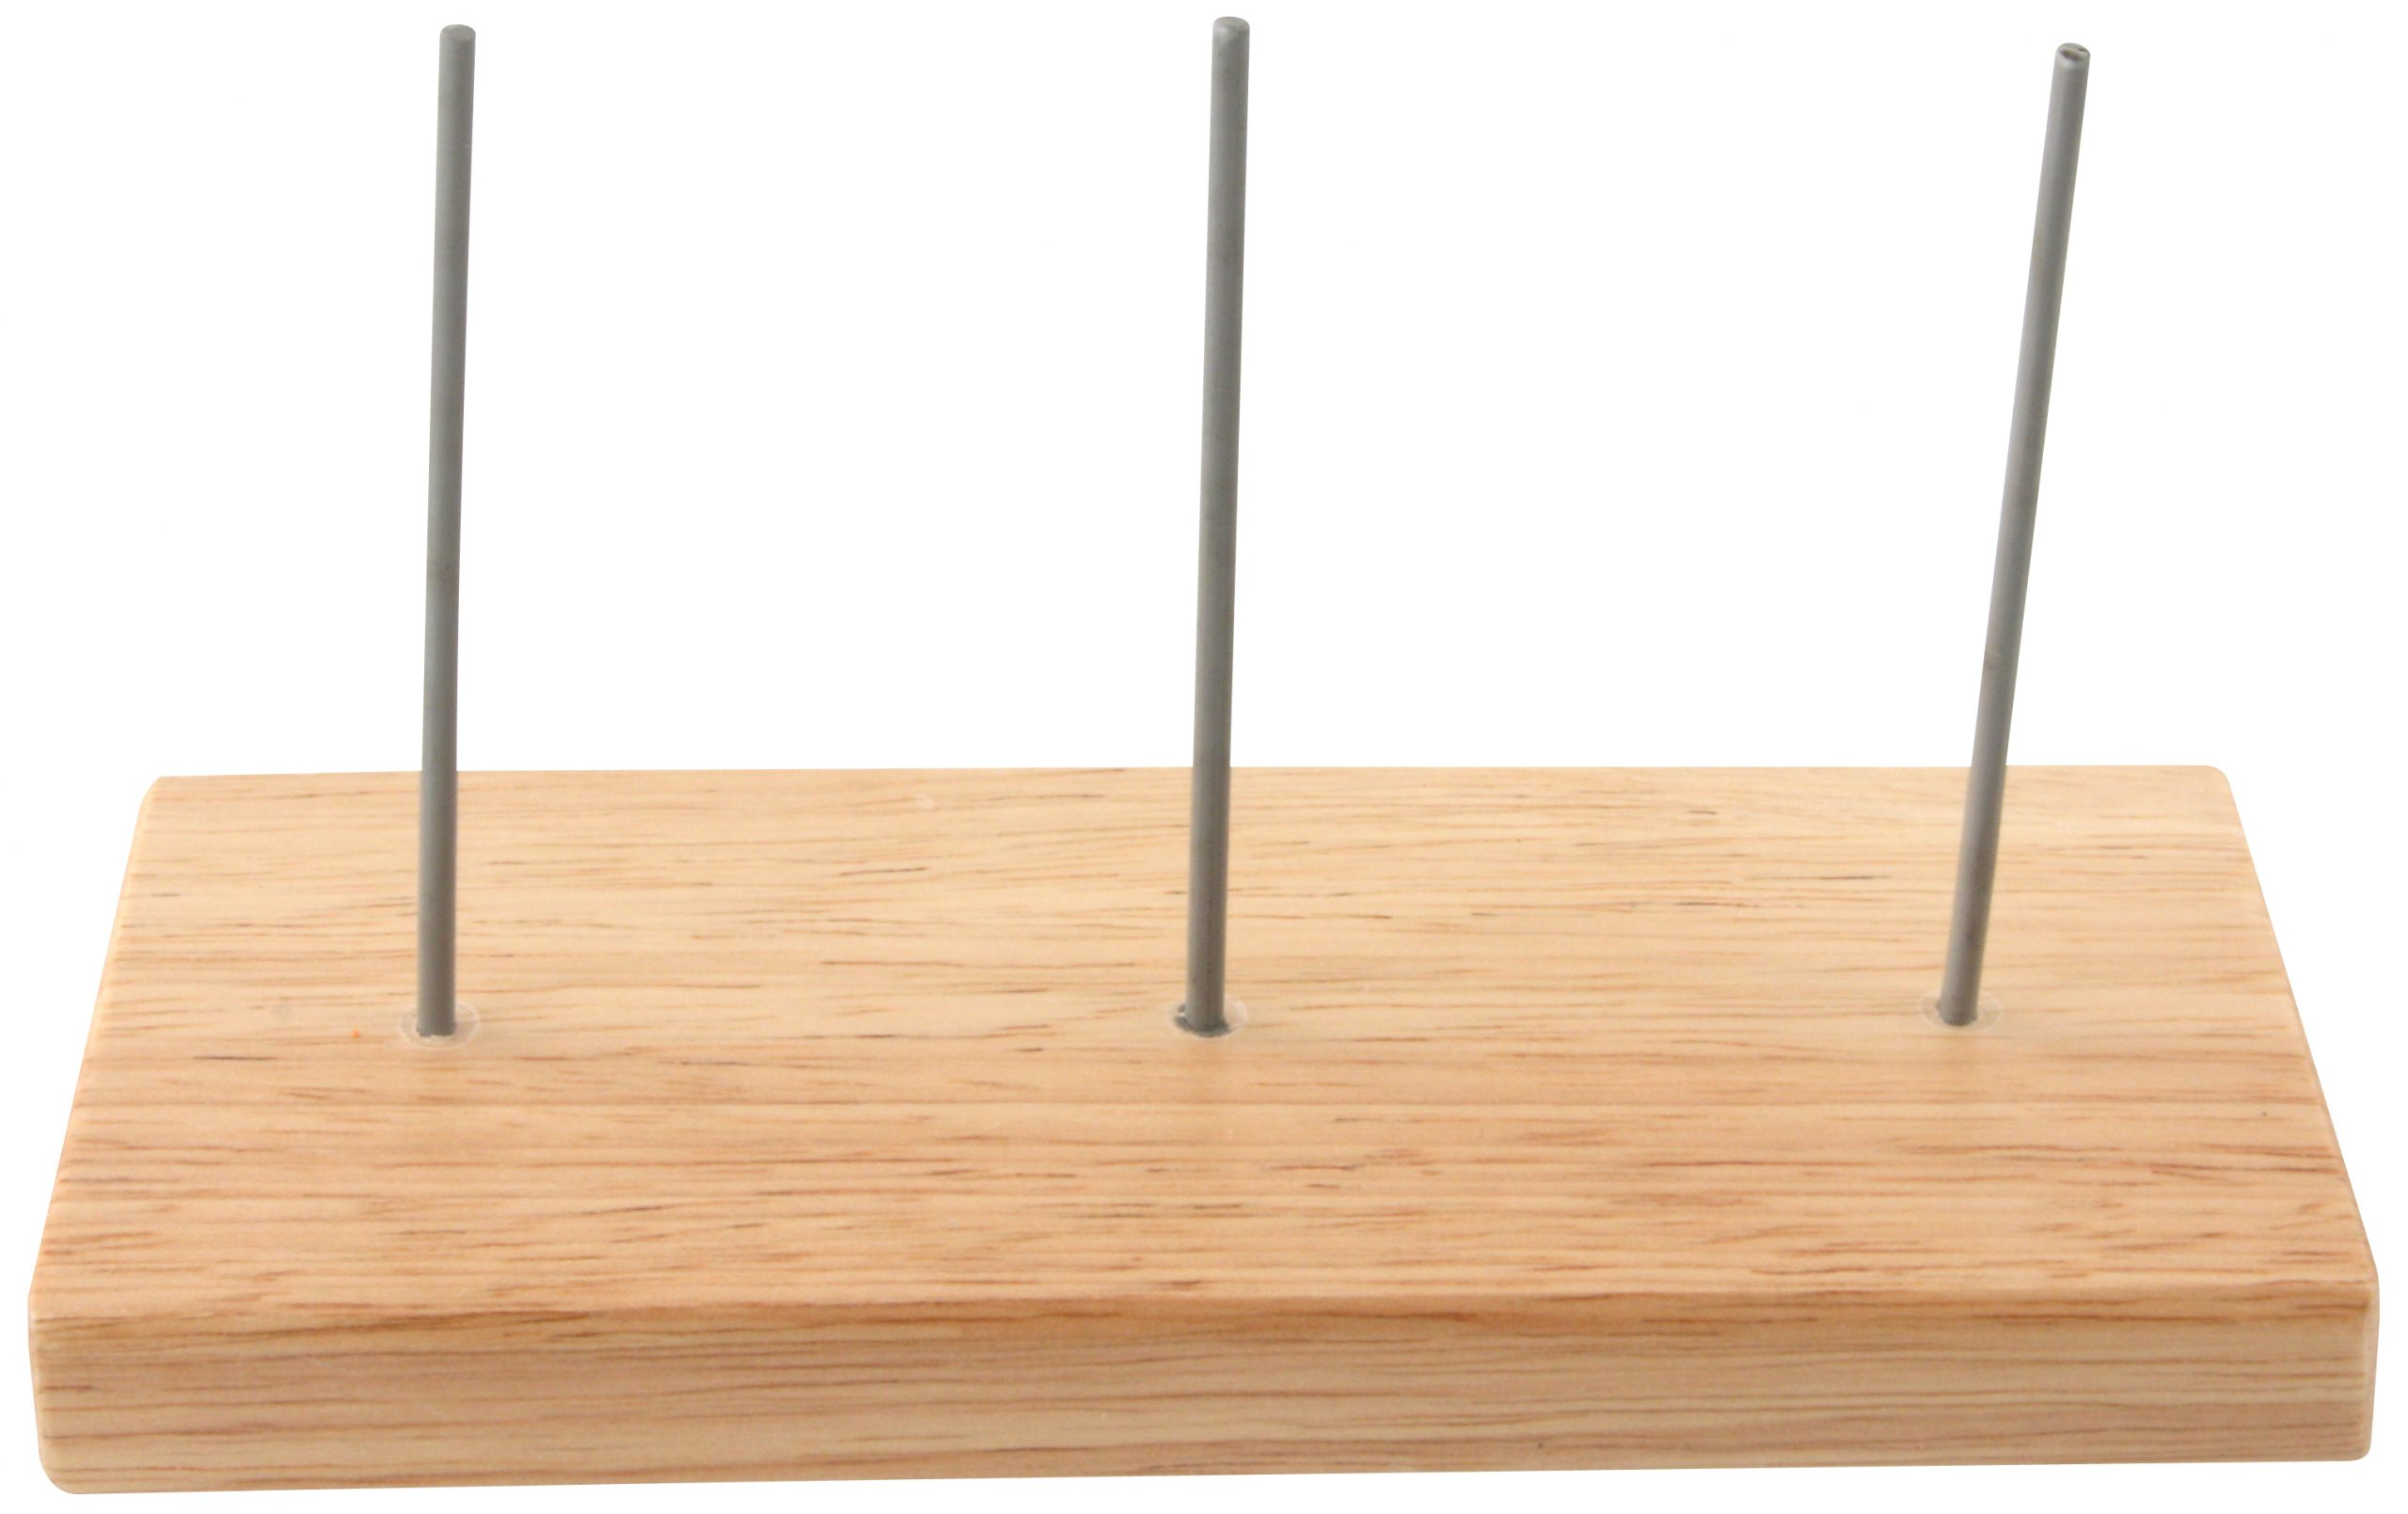 Bonspieß 3-fach Holzfuß